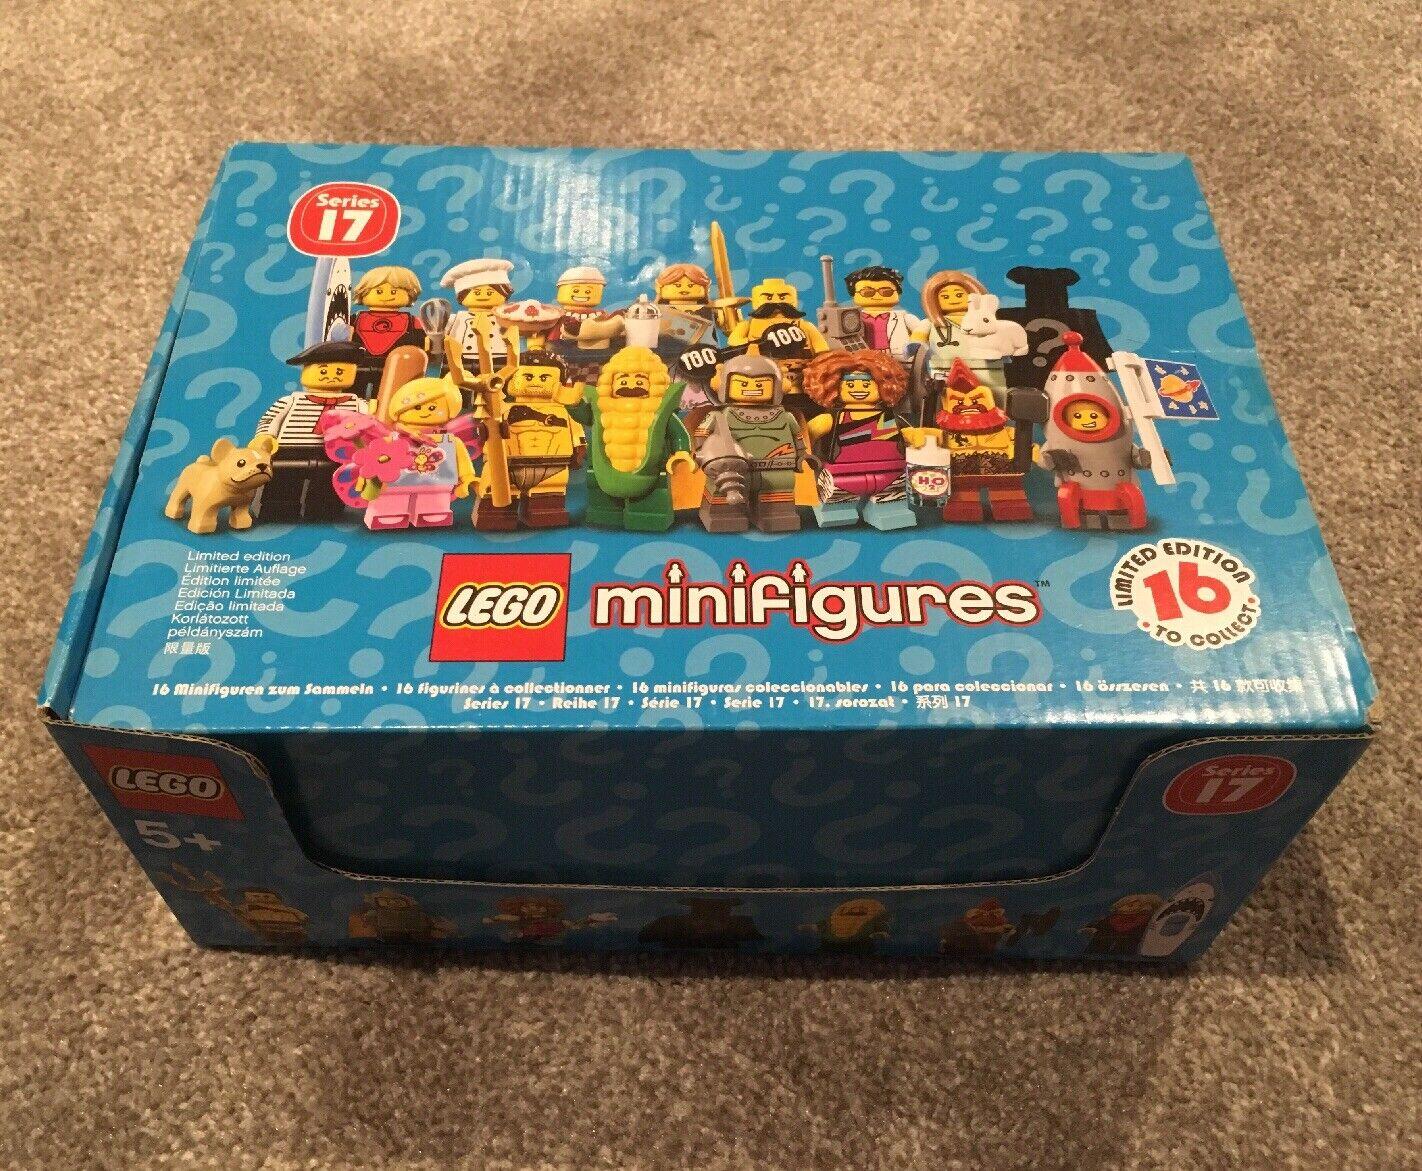 LEGO Series 17 Minifigures    71018   Brand nouveau & Sealed   Box of 60 sacs    juste l'acheter